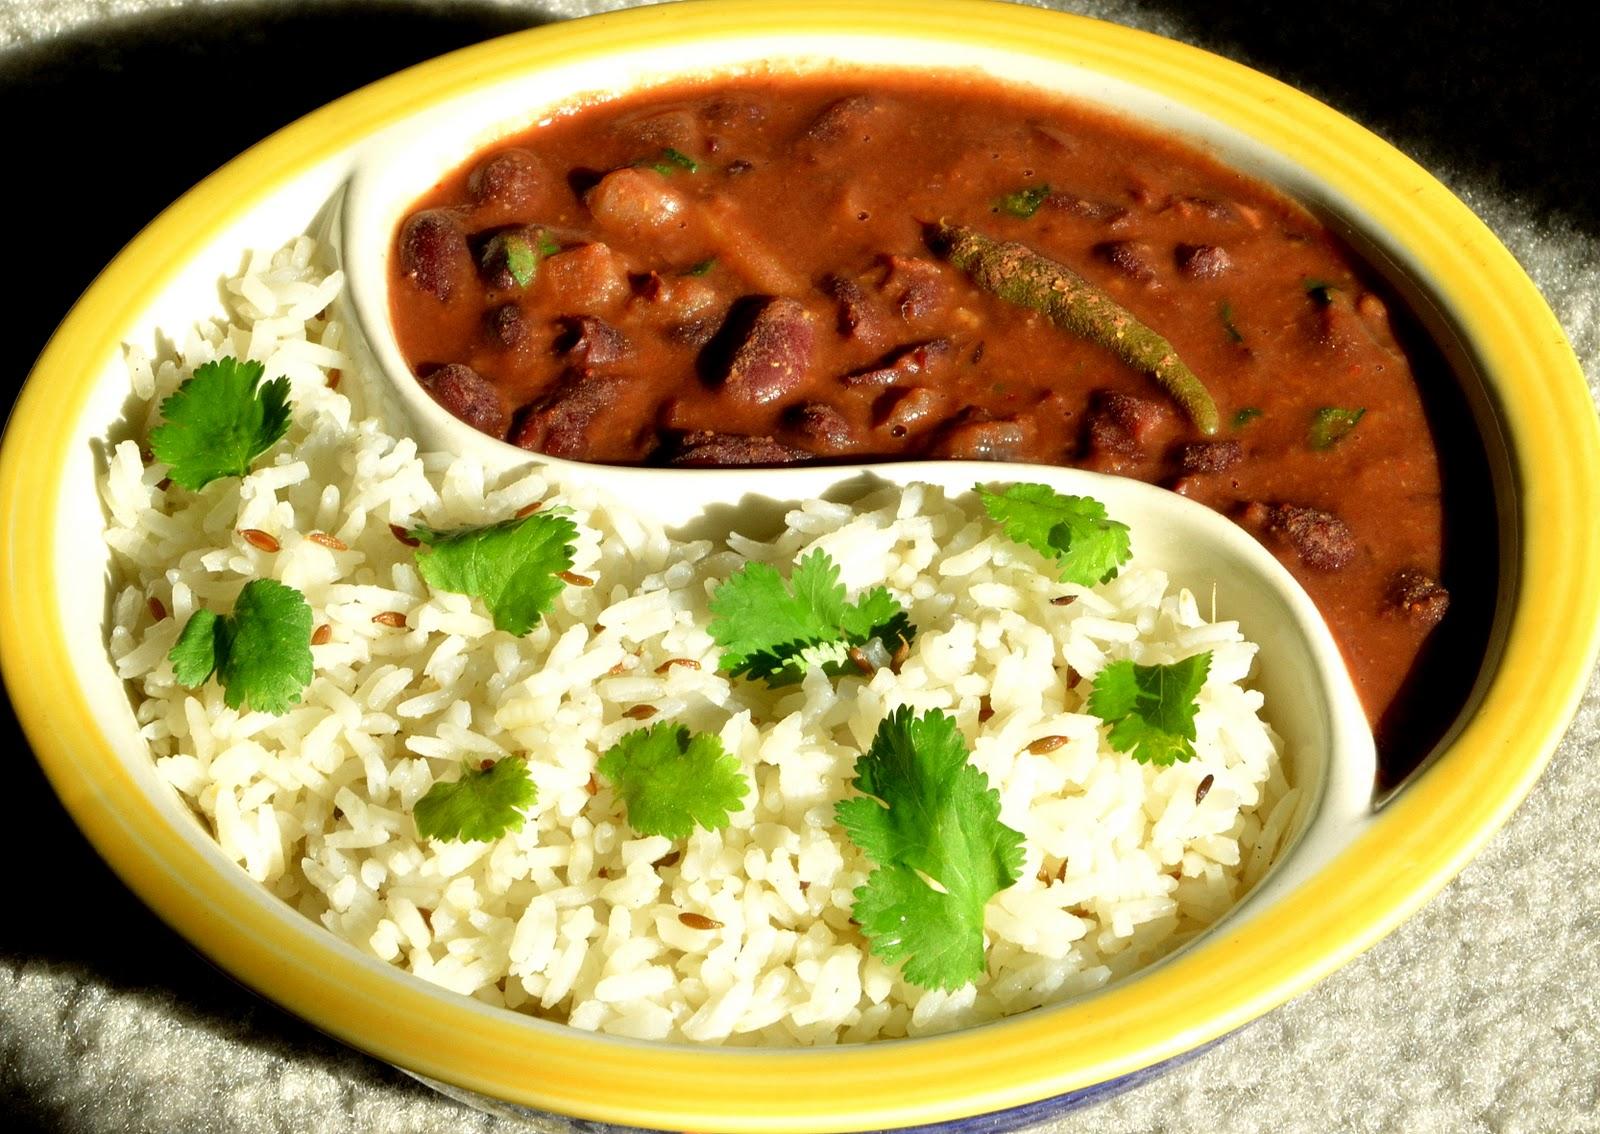 Top 10 jammu and kashmir foods for you flavorverse - Kashmir indian cuisine ...